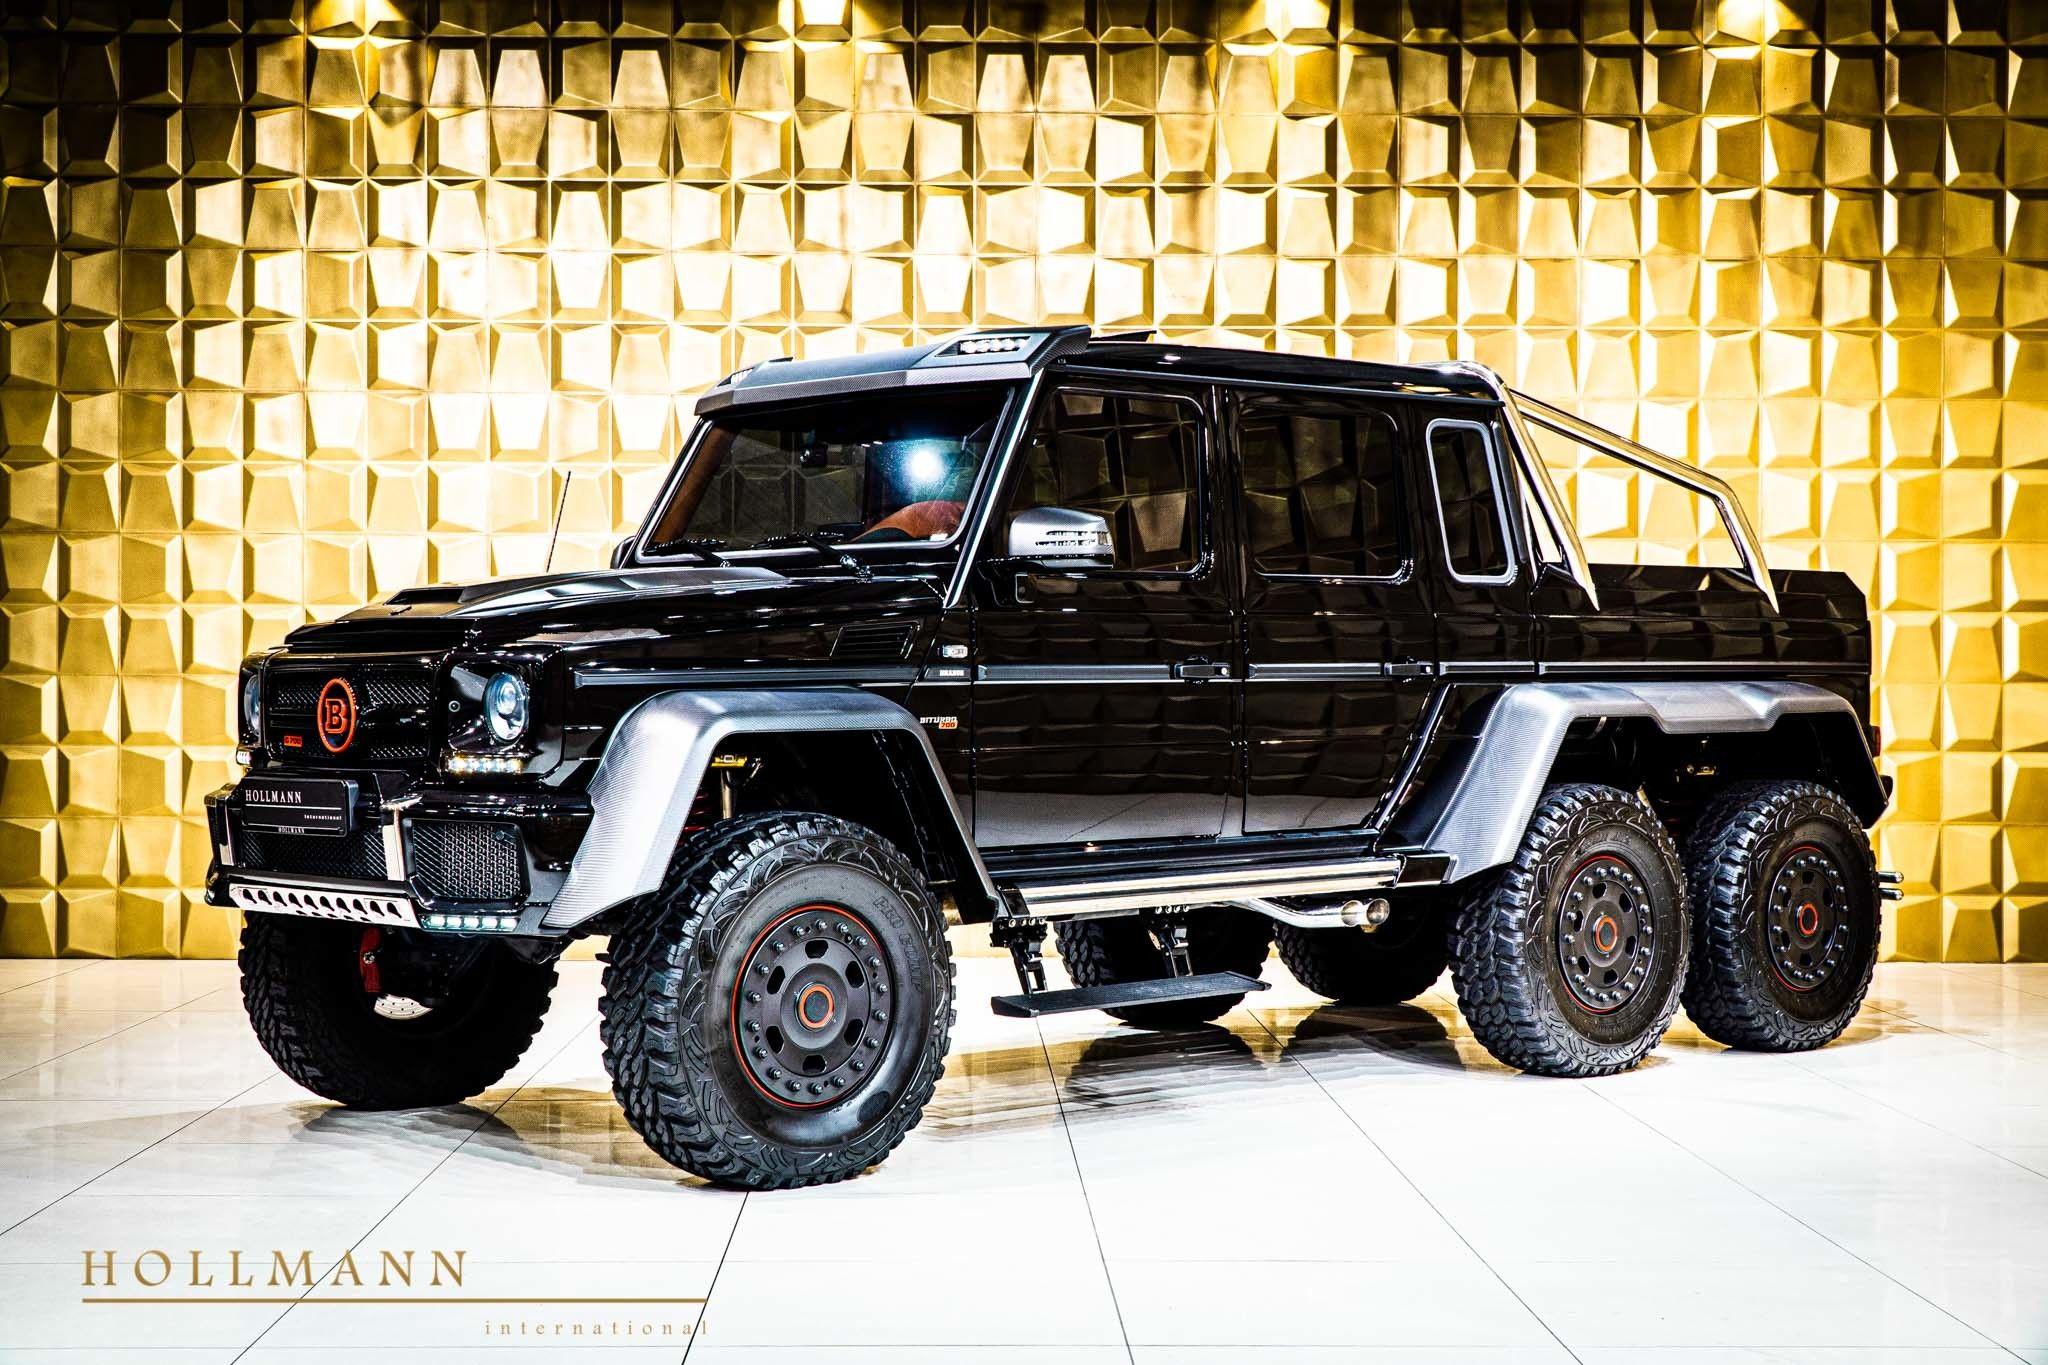 Mercedes Benz G 63 6x6 Amg Brabus 700 Hollmann International